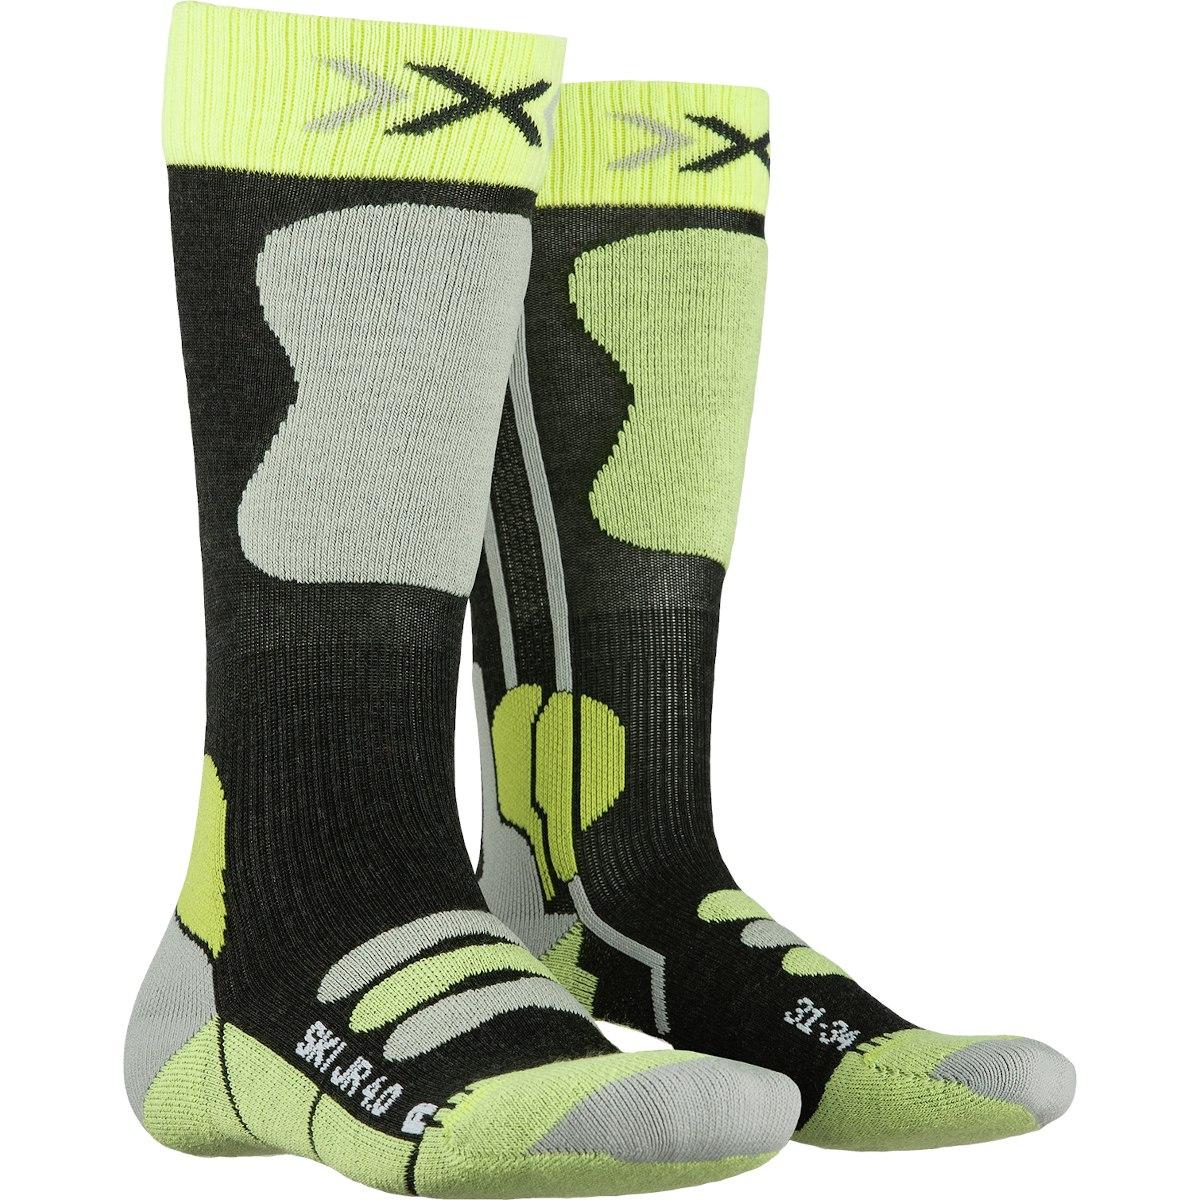 Bild von X-Socks Ski Junior 4.0 Kindersocken - anthracite melange/green lime